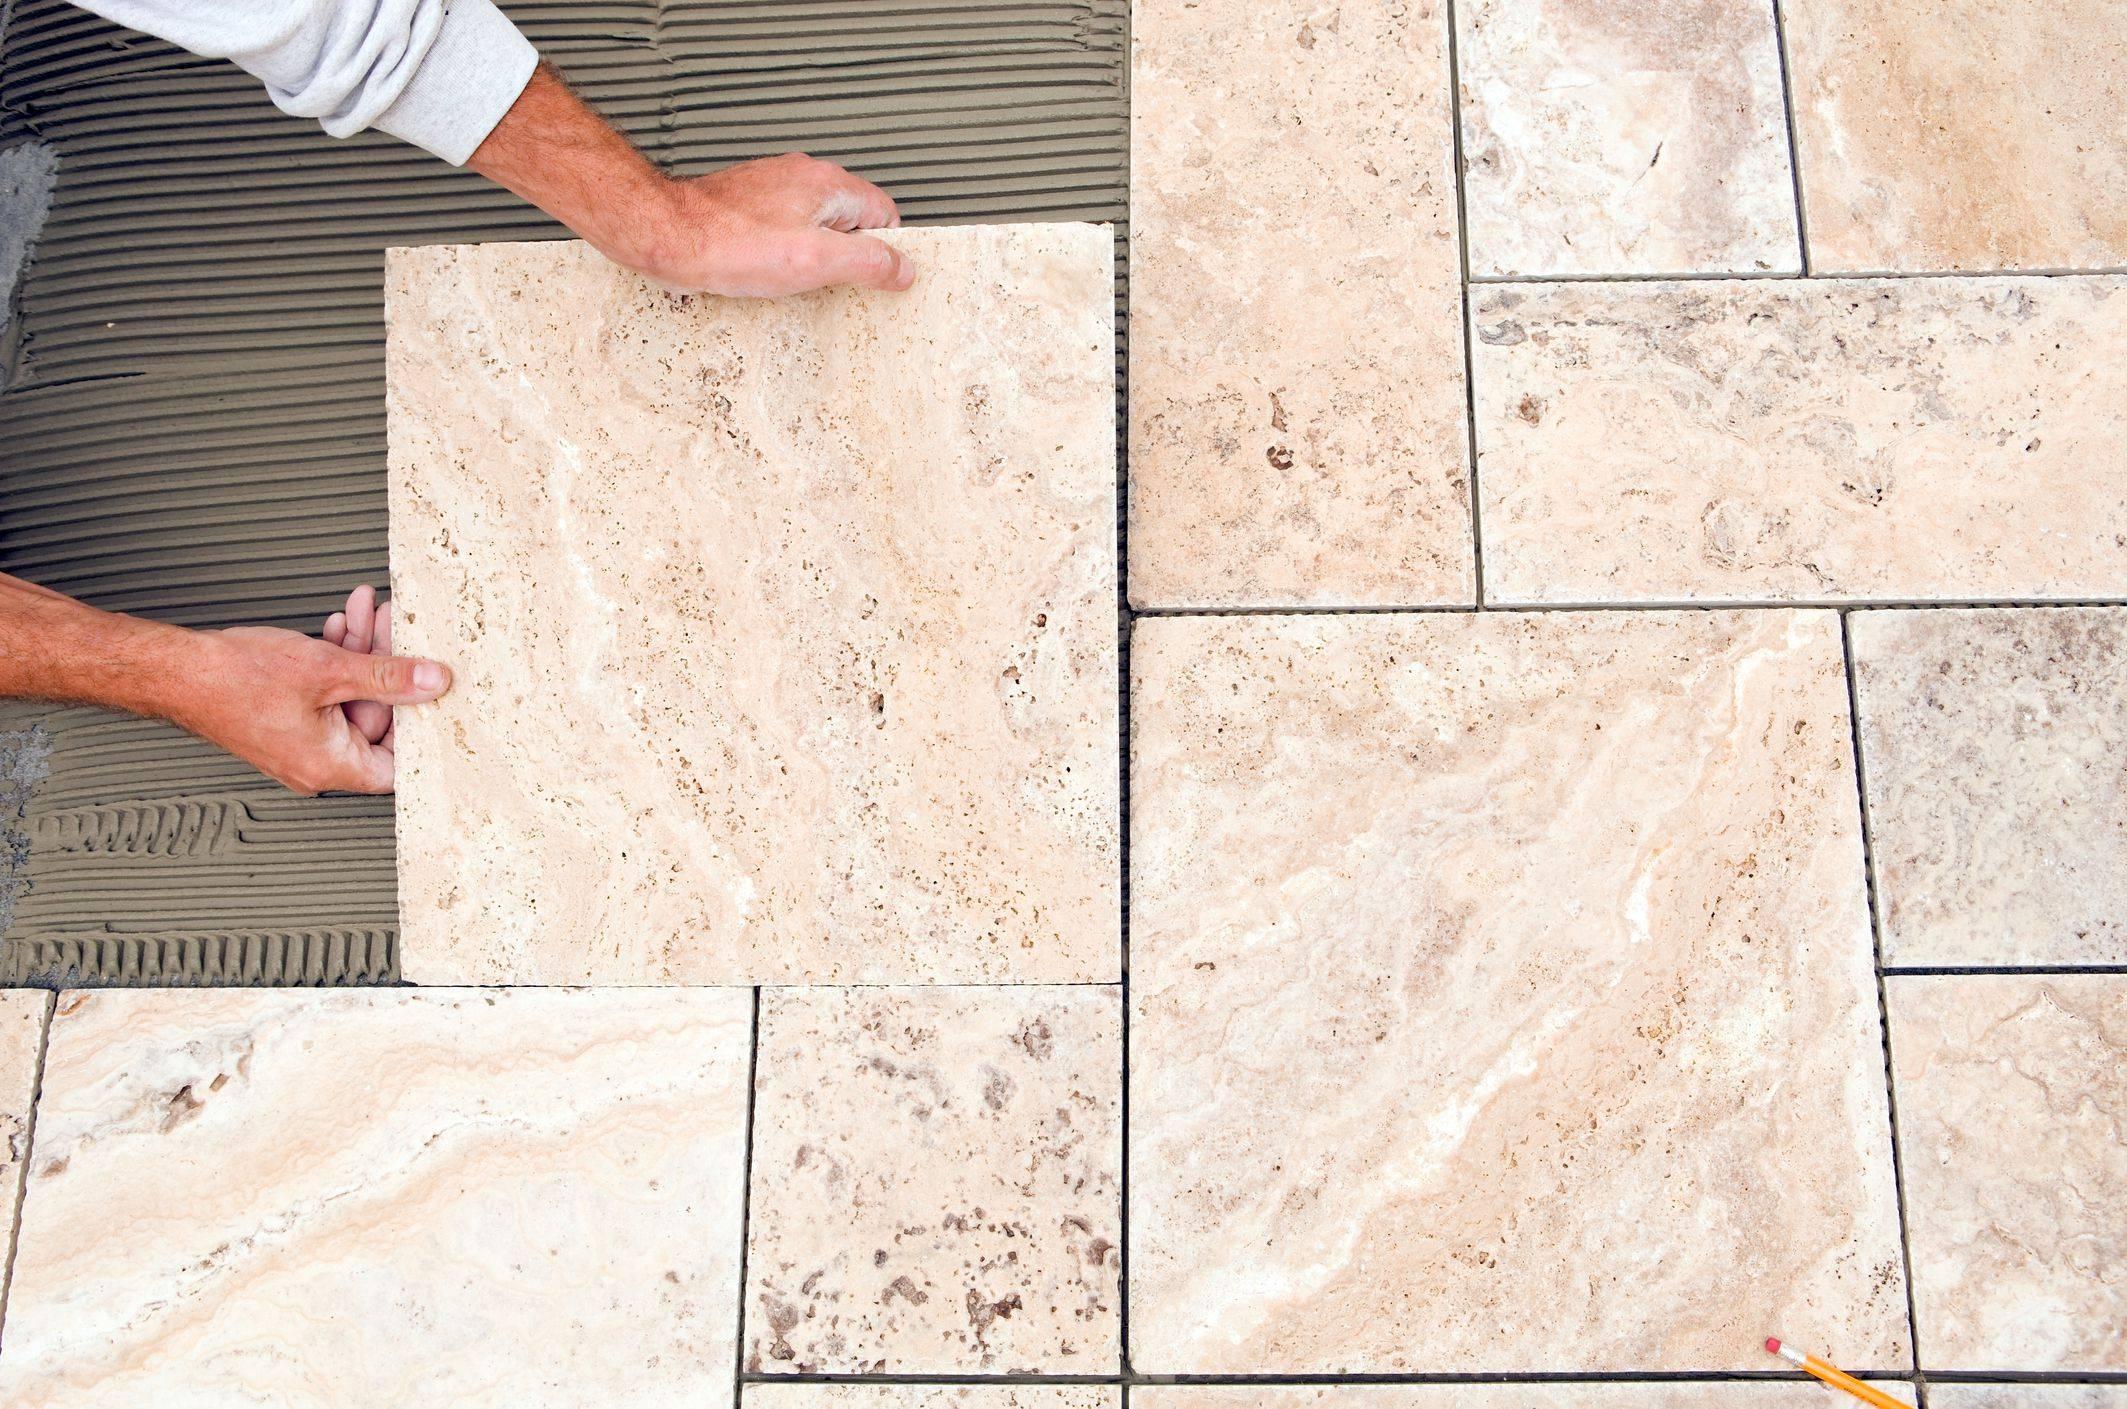 worker places new tile on a bathroom floor 37f501b04b5d401cb5ca7edcdd8686b5